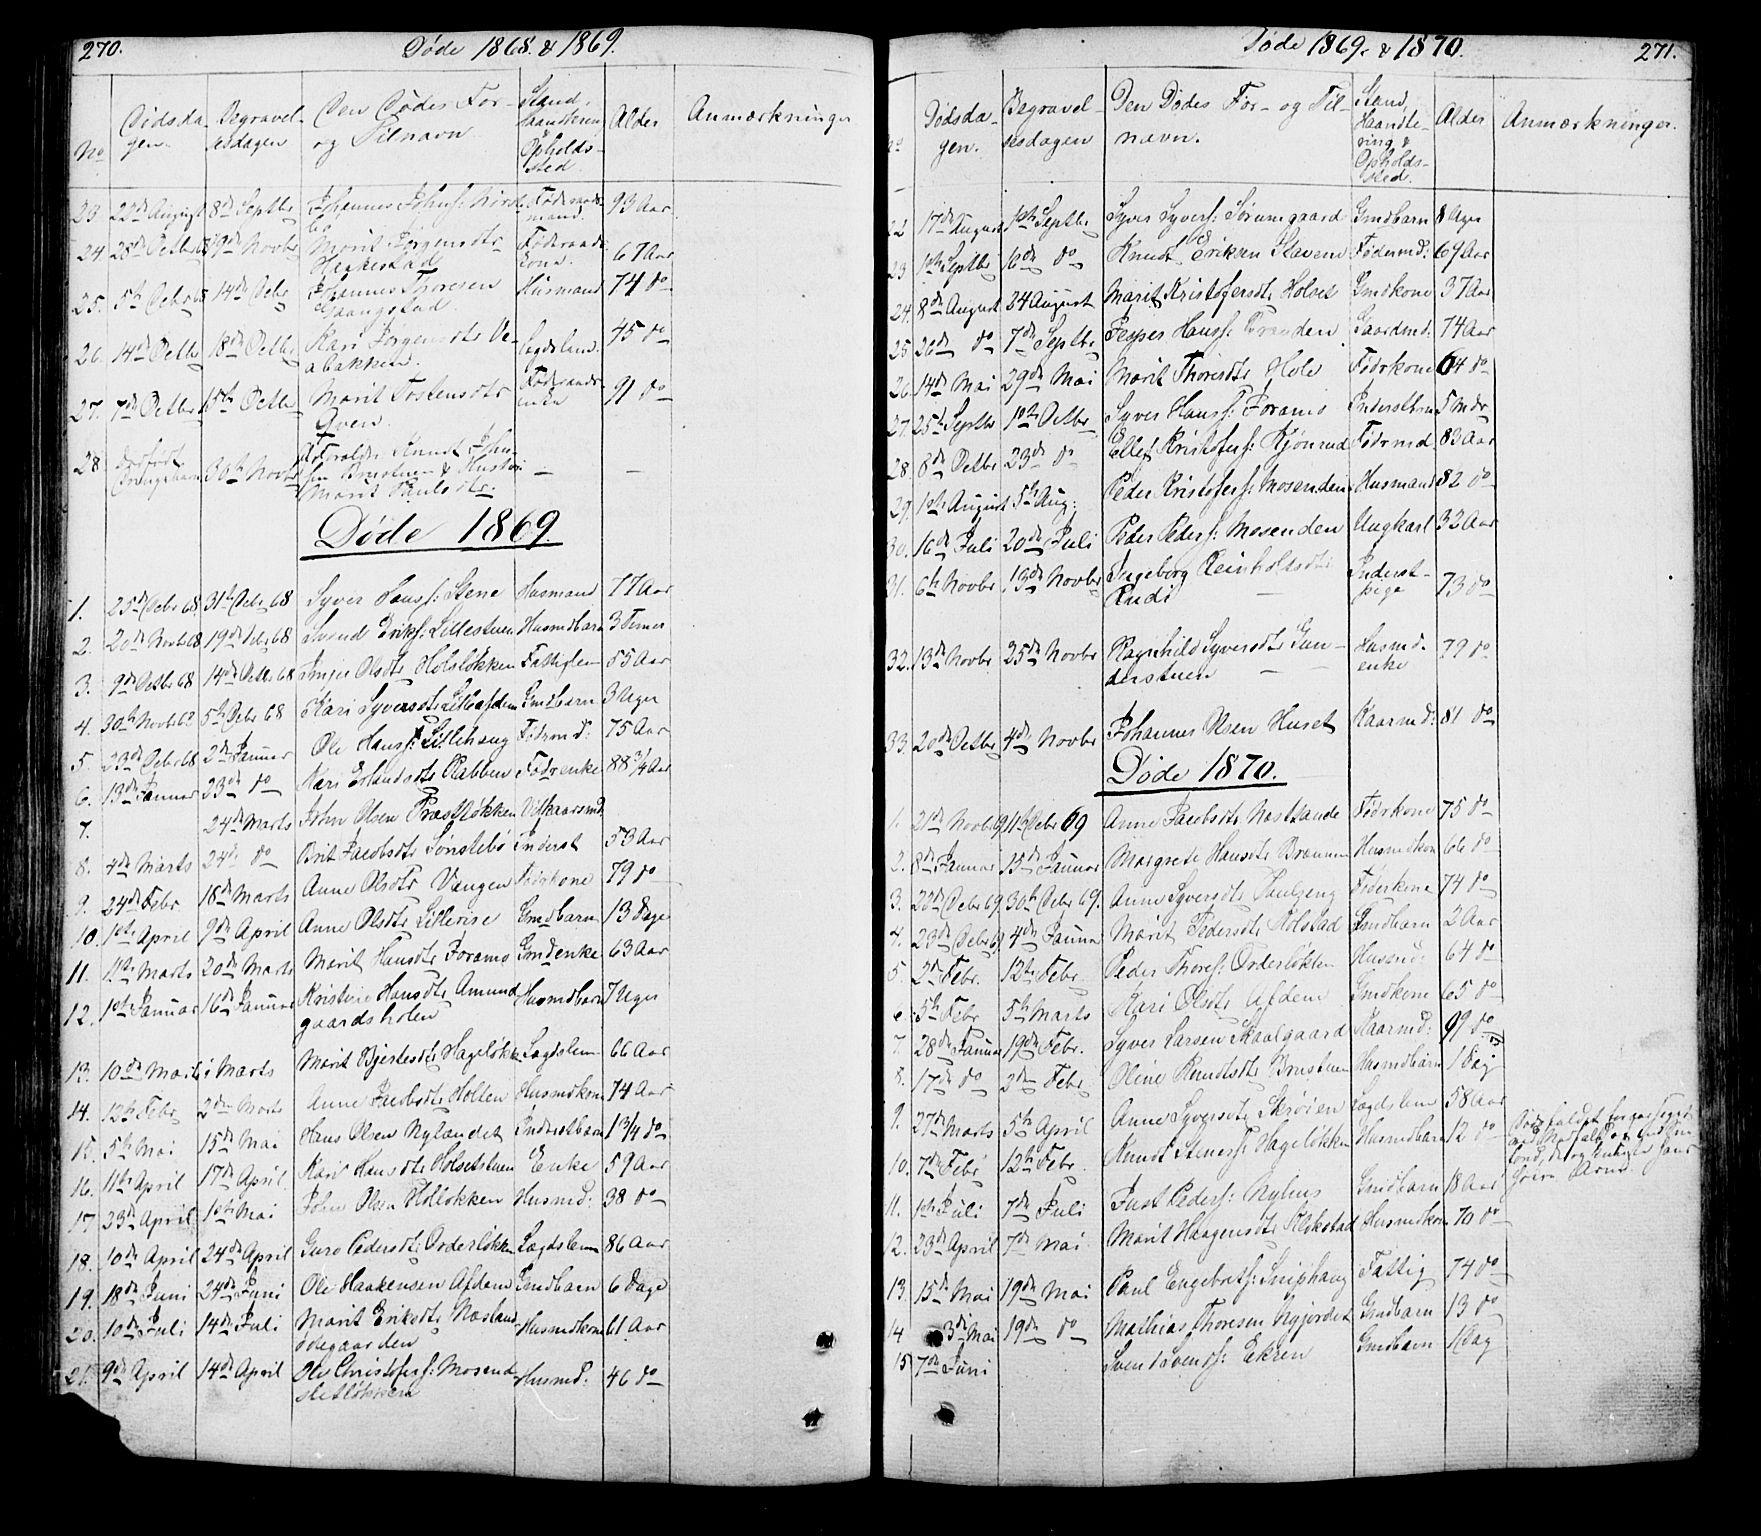 SAH, Lesja prestekontor, Klokkerbok nr. 5, 1850-1894, s. 270-271